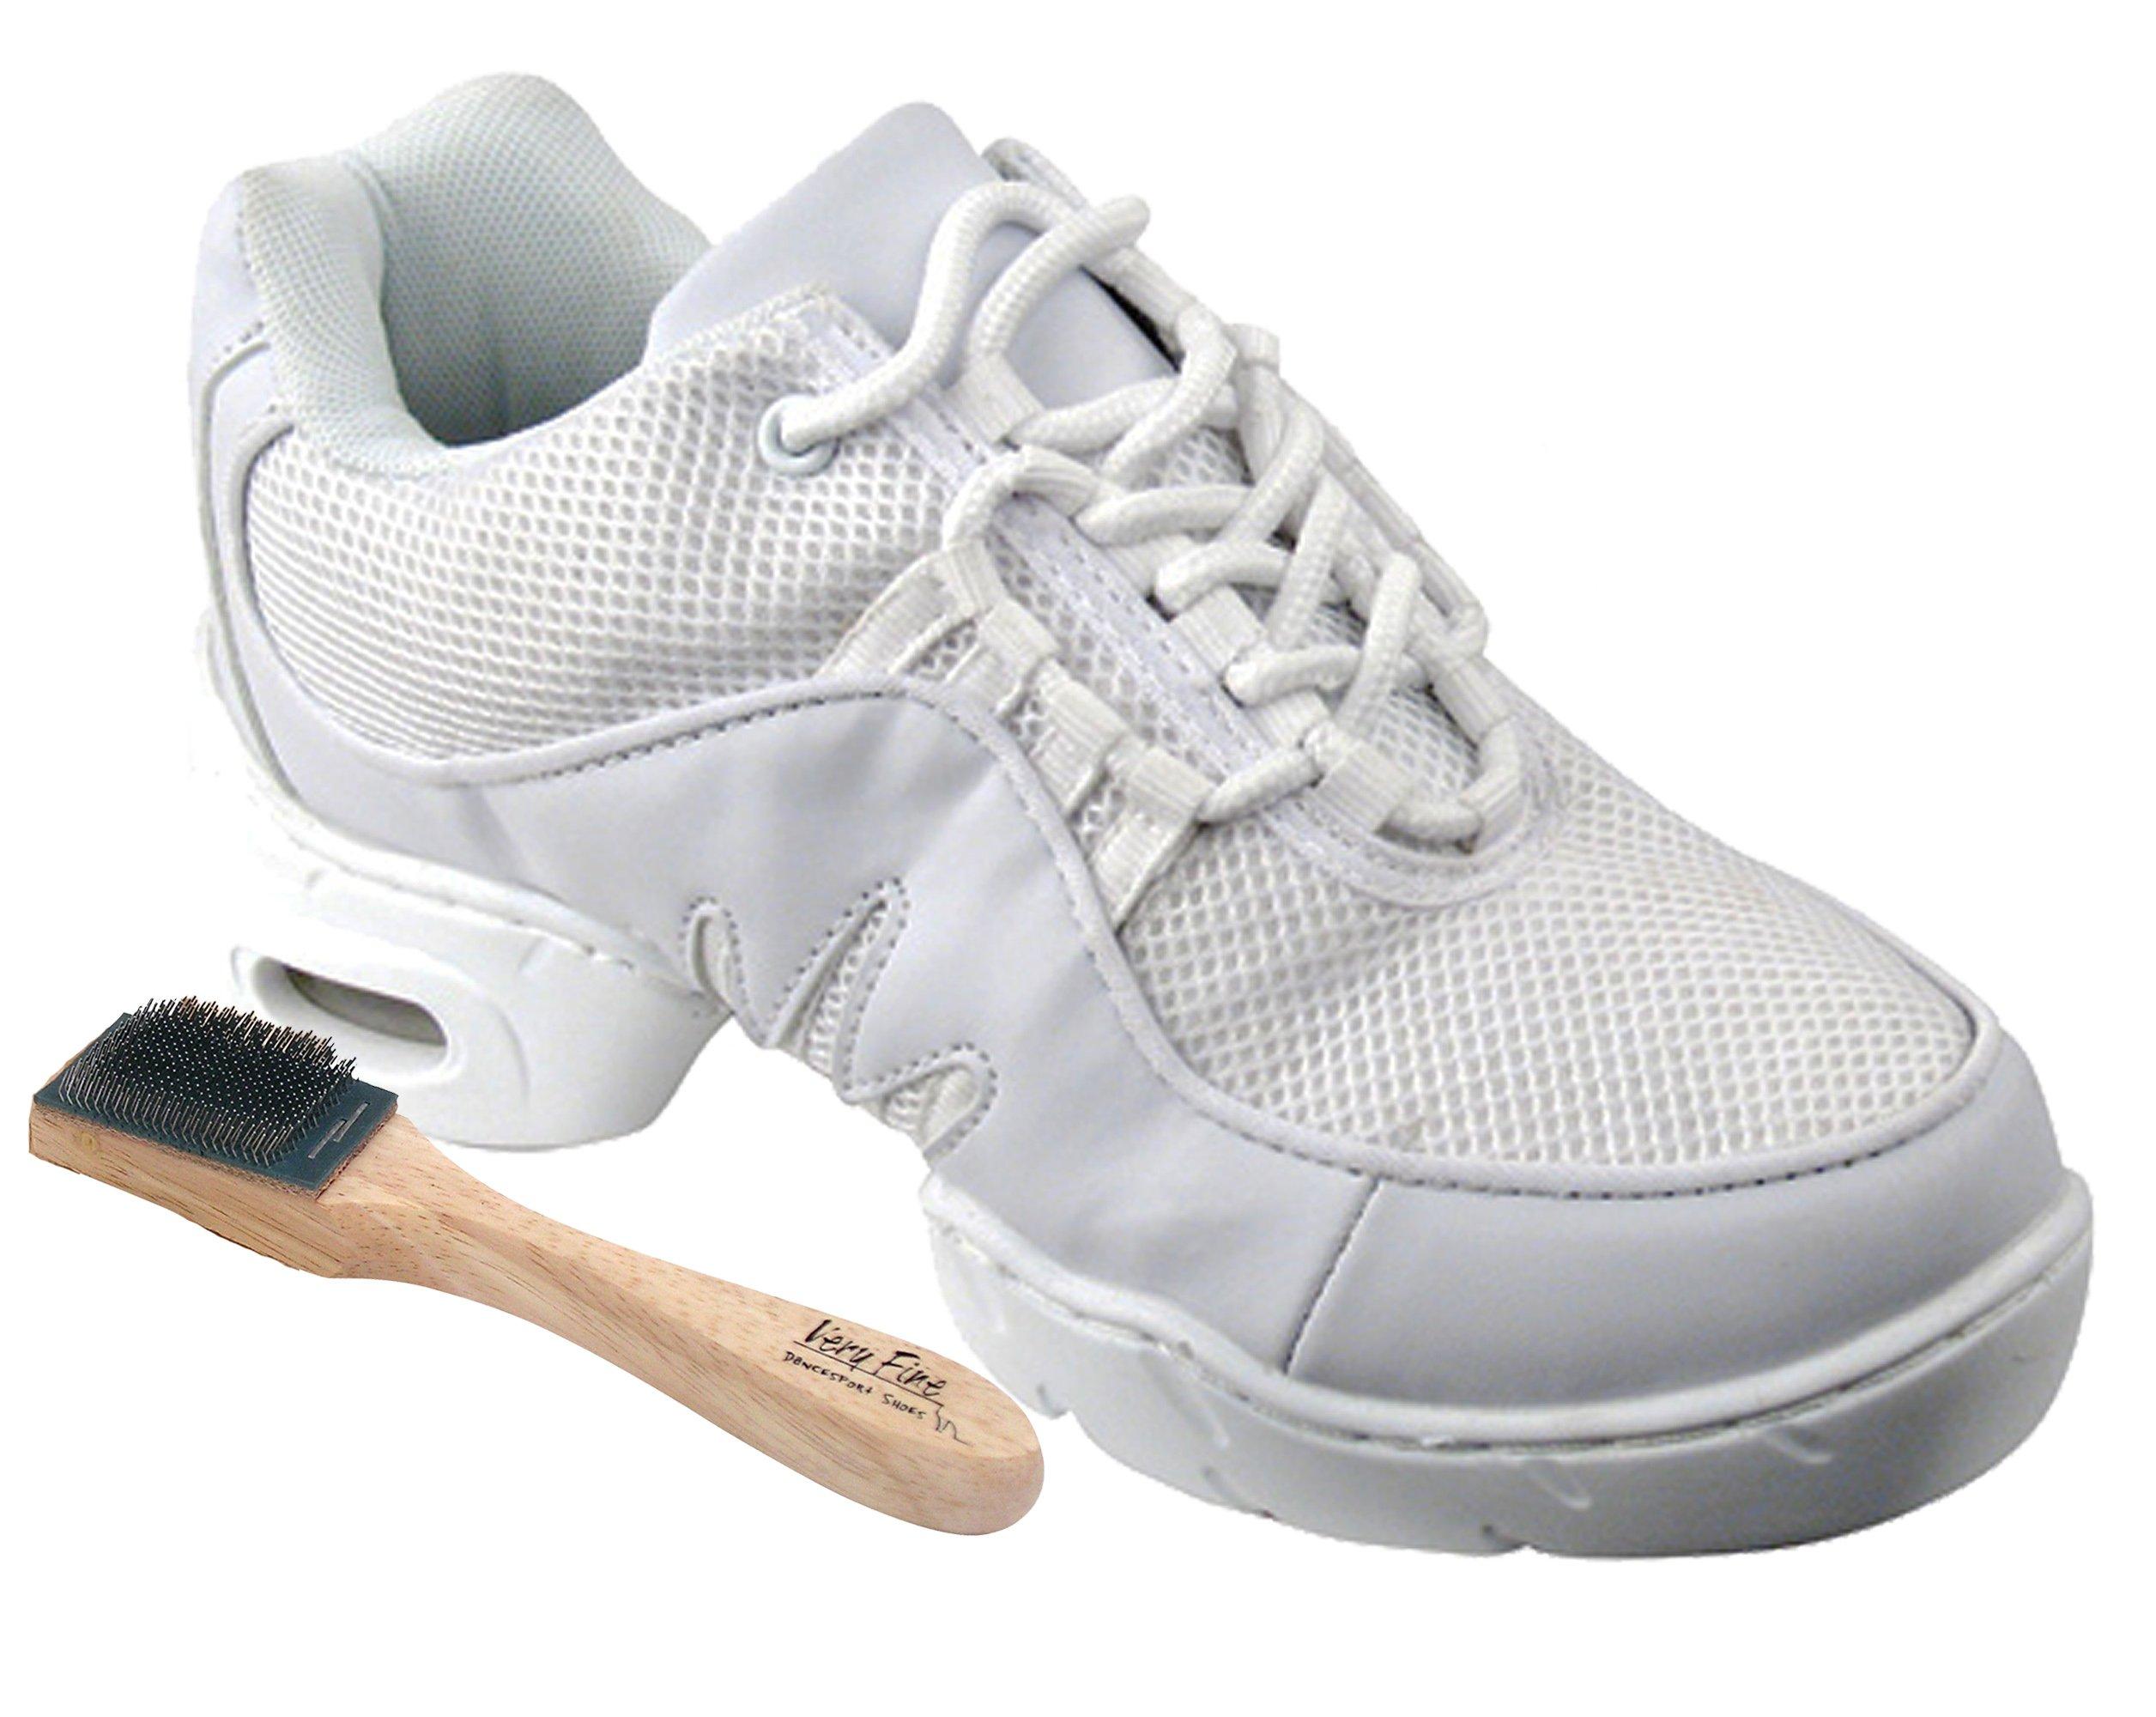 Very Fine Men's Women's Salsa Ballroom Latin Zumba Hip Hop Dance Sneakers Style VFSN002 Bundle with Dance Shoe Wire Brush, White 14.5 M US (US Women 14.5/ US Men 13)